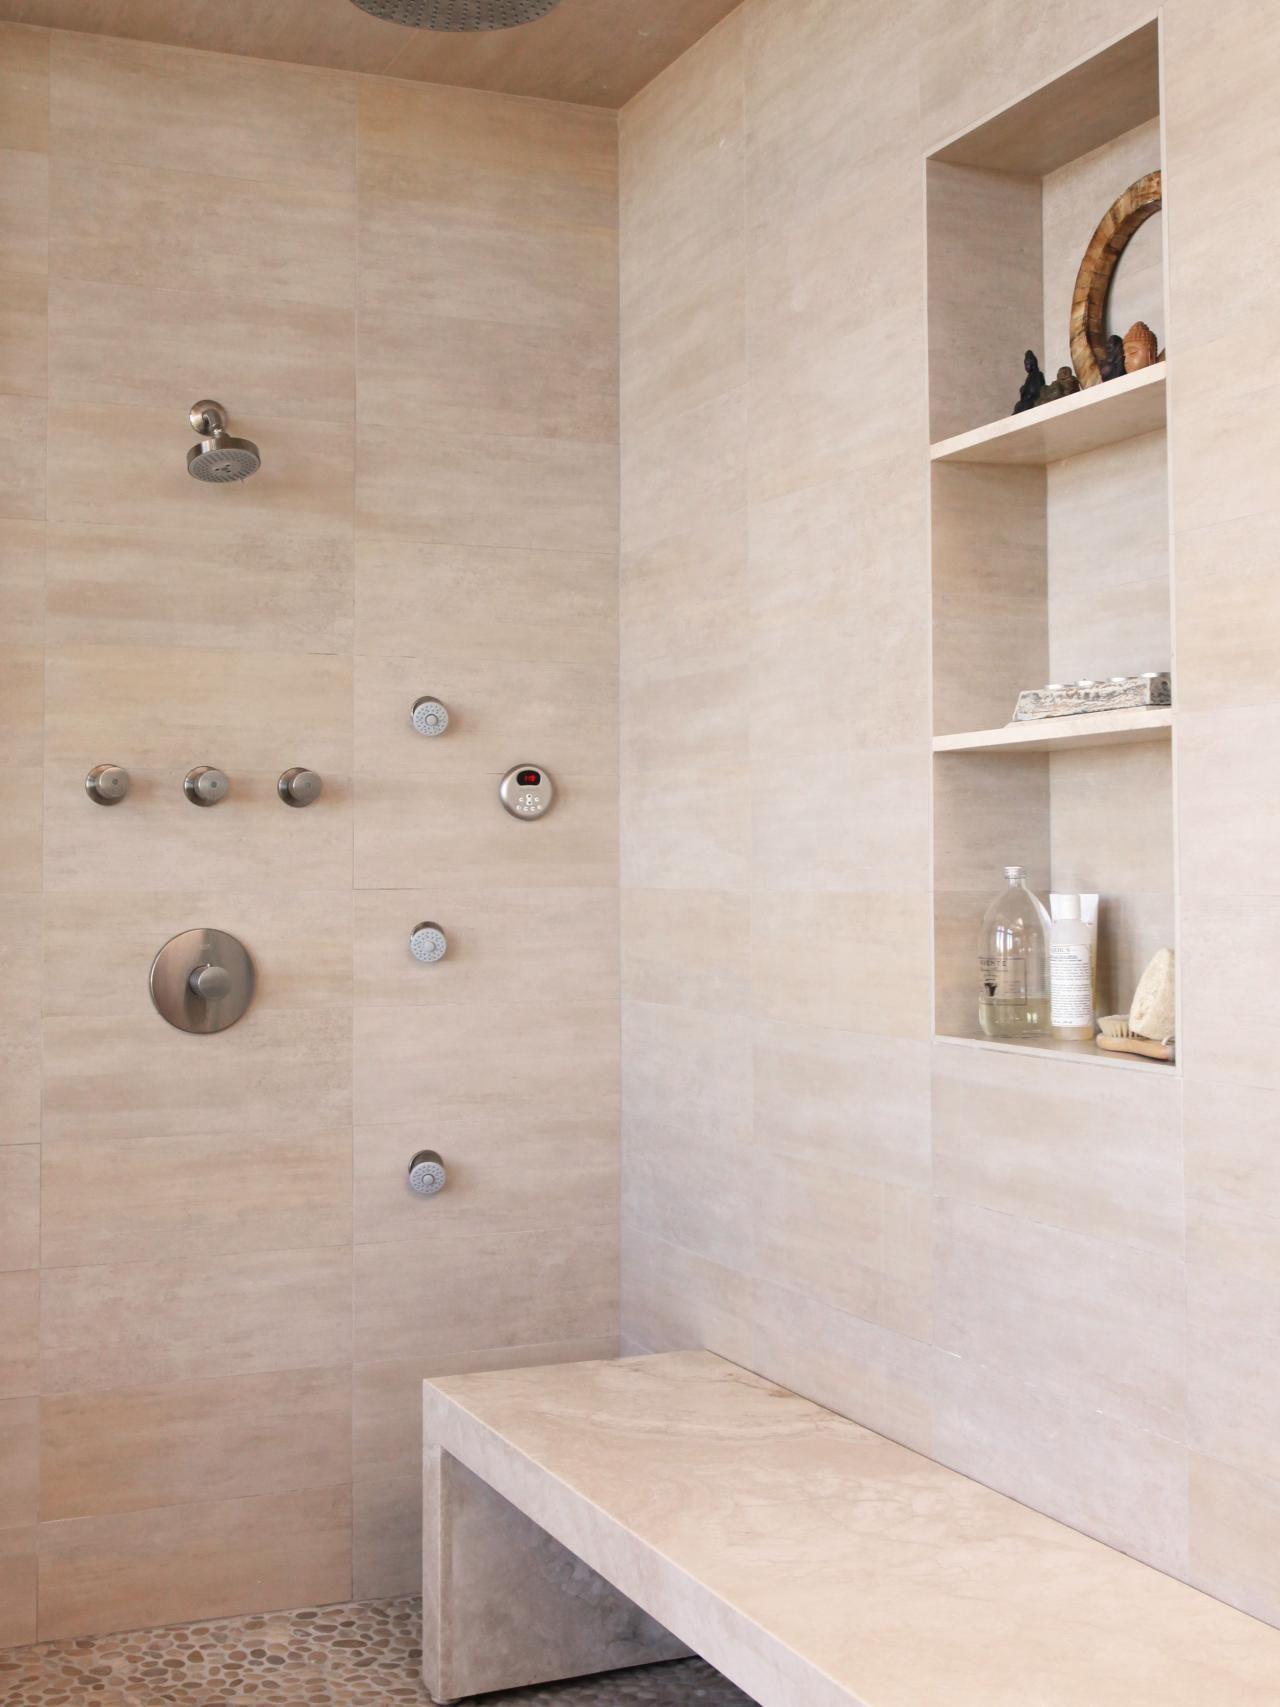 tuck nip bathroom ci hgtvcom remodeling storage s shower rend